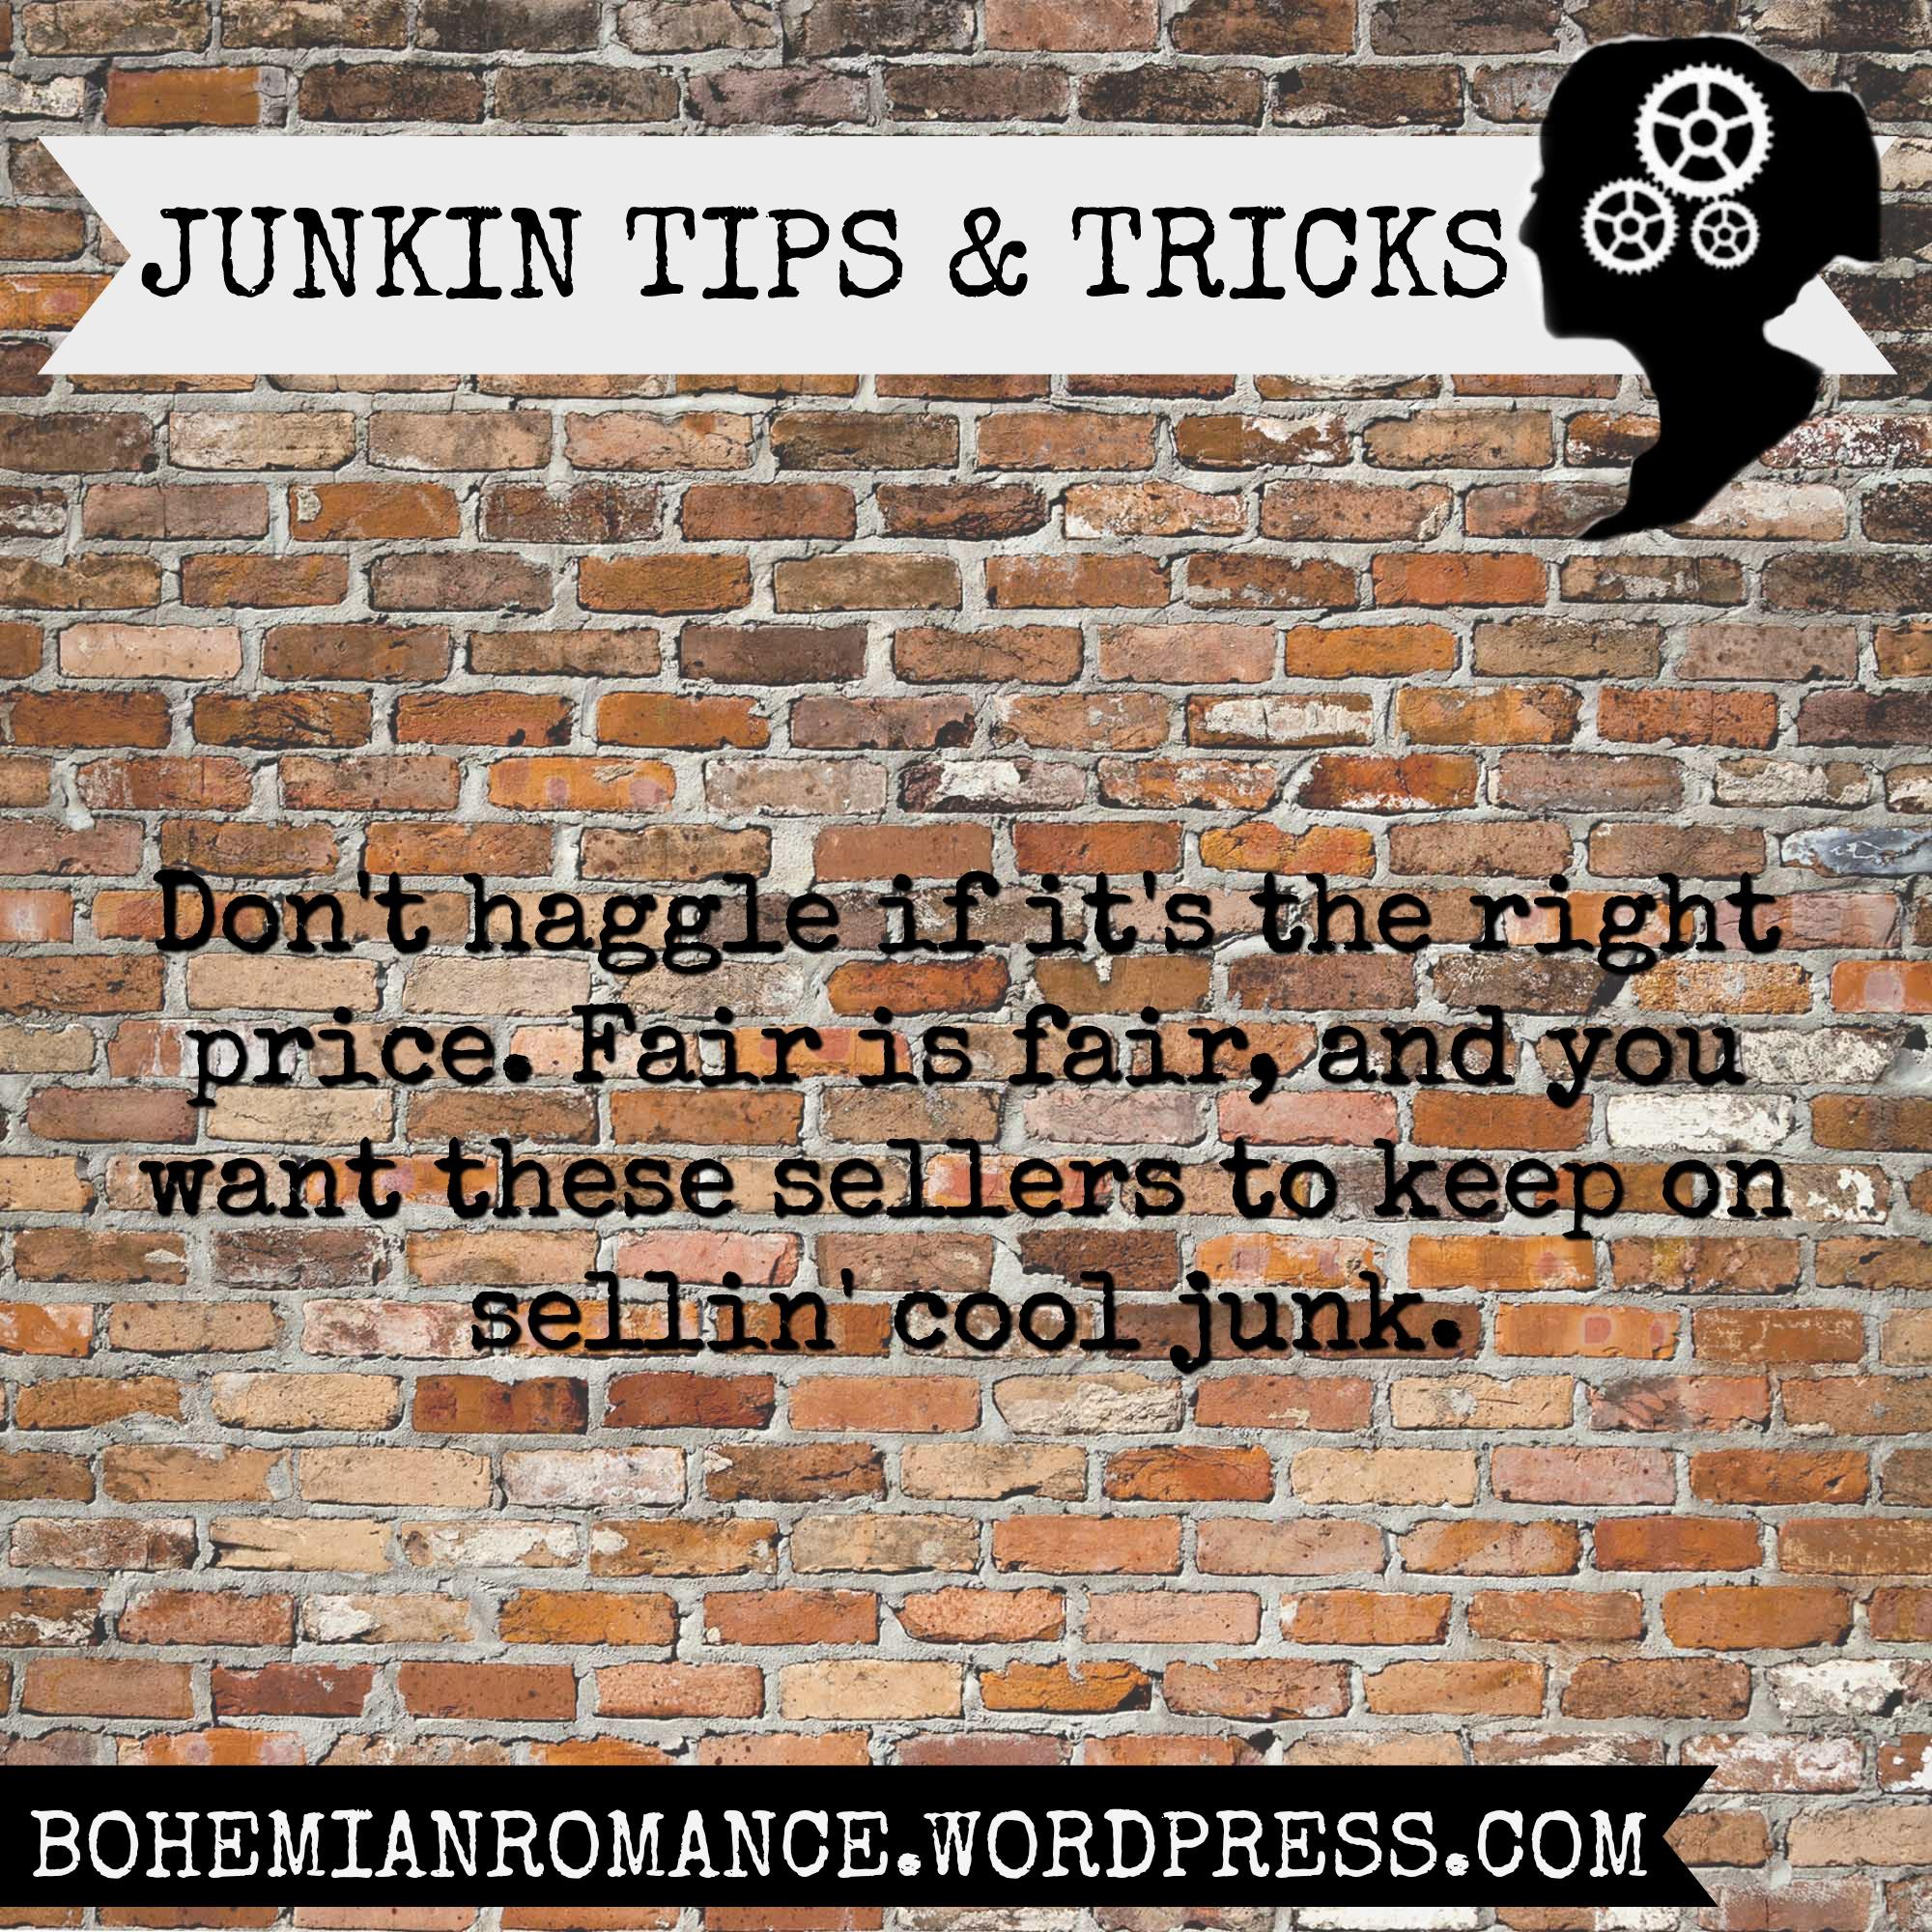 40-junkin-tips-tricks-template